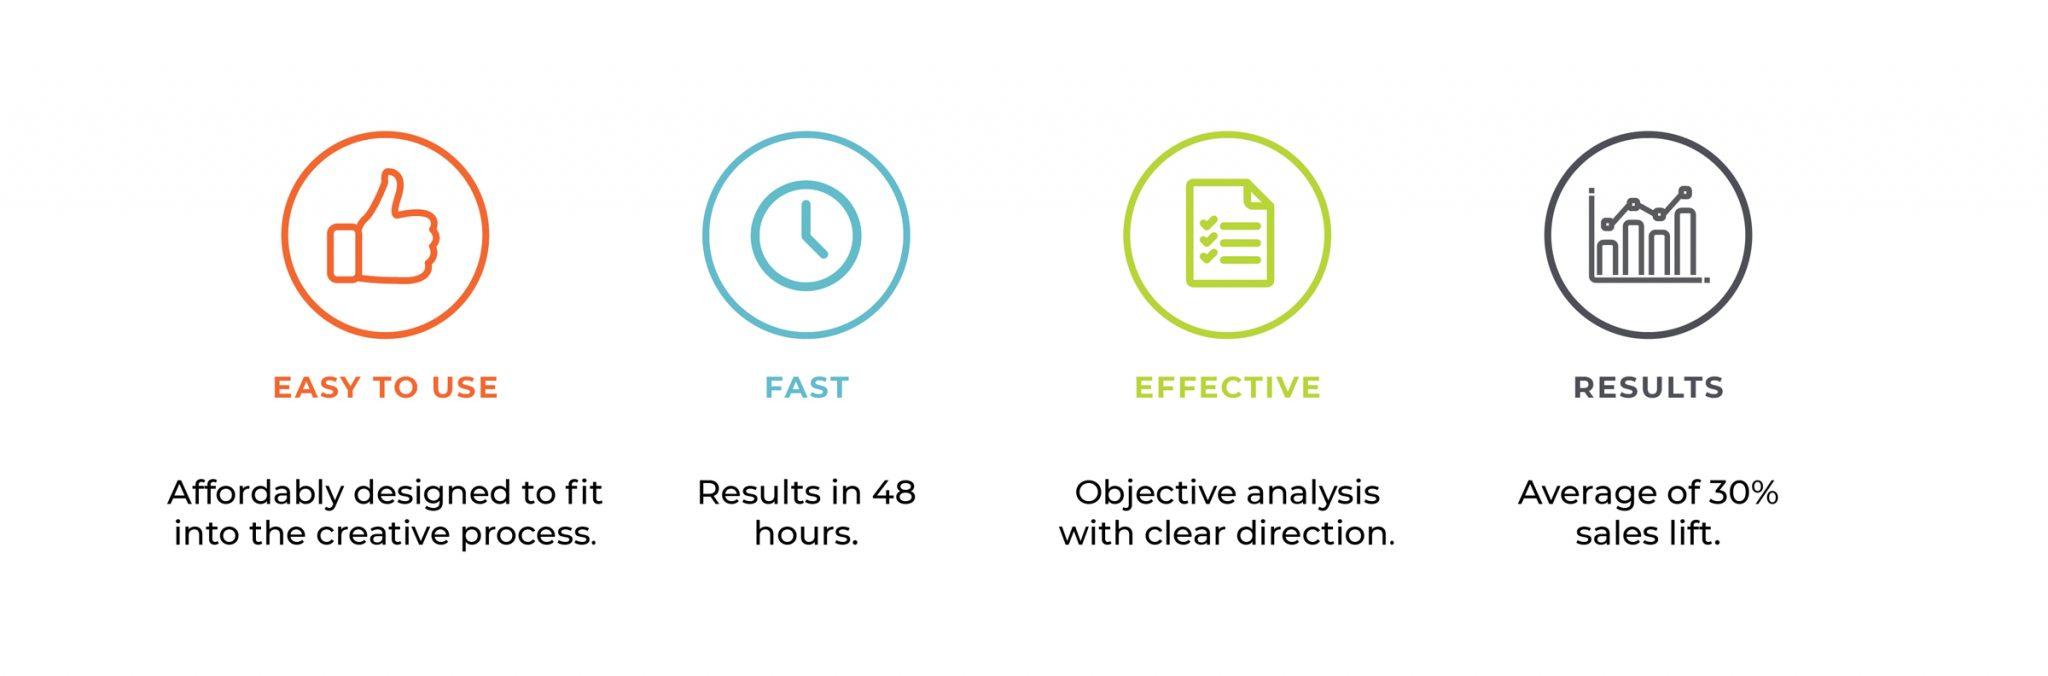 Benefits of design service